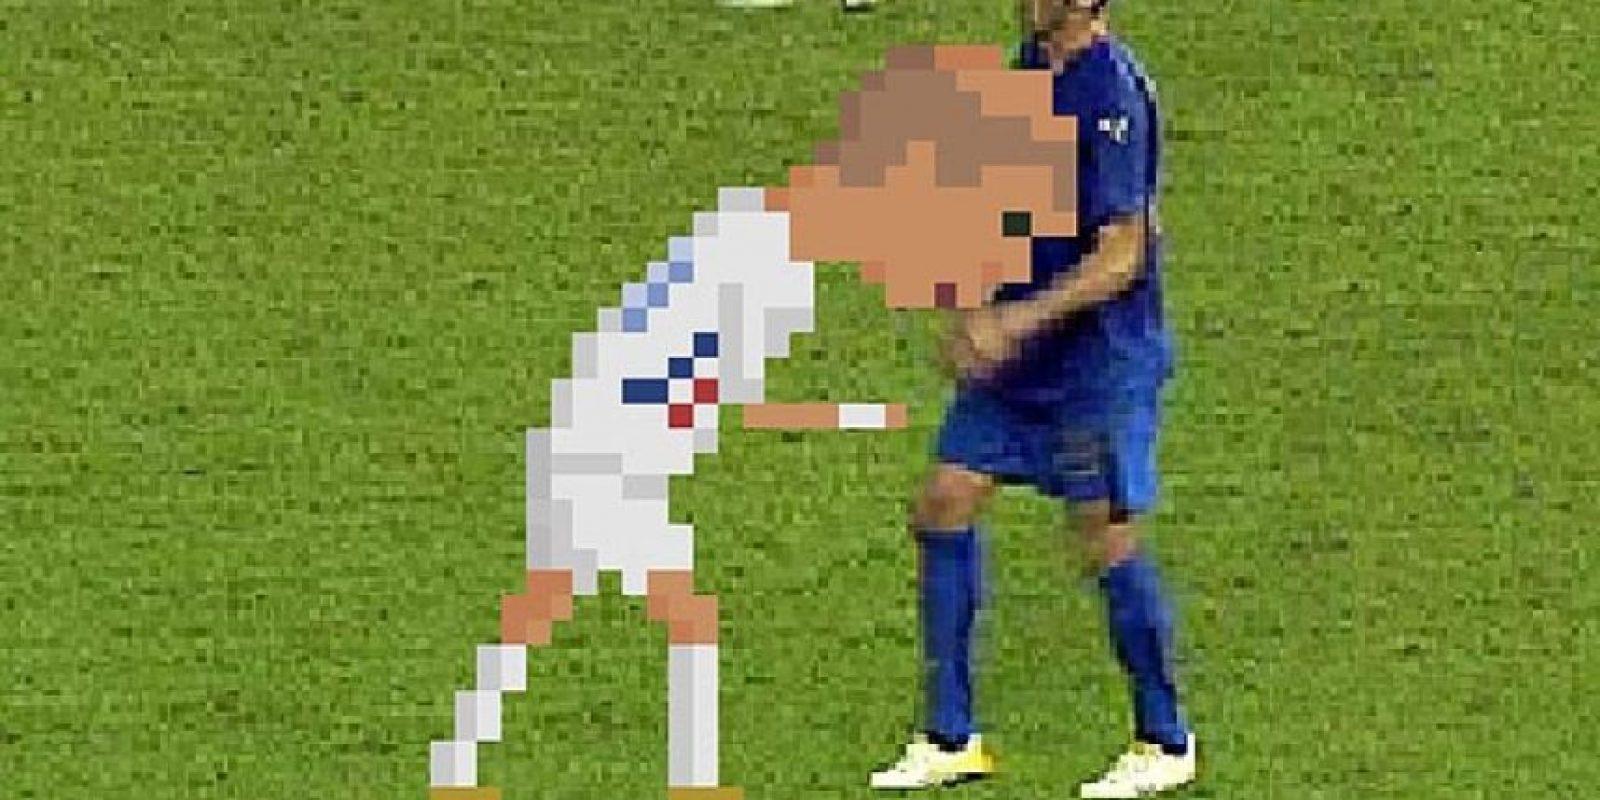 El cabezazo de Zidane a Materazzi. Foto:Matheus Toscano